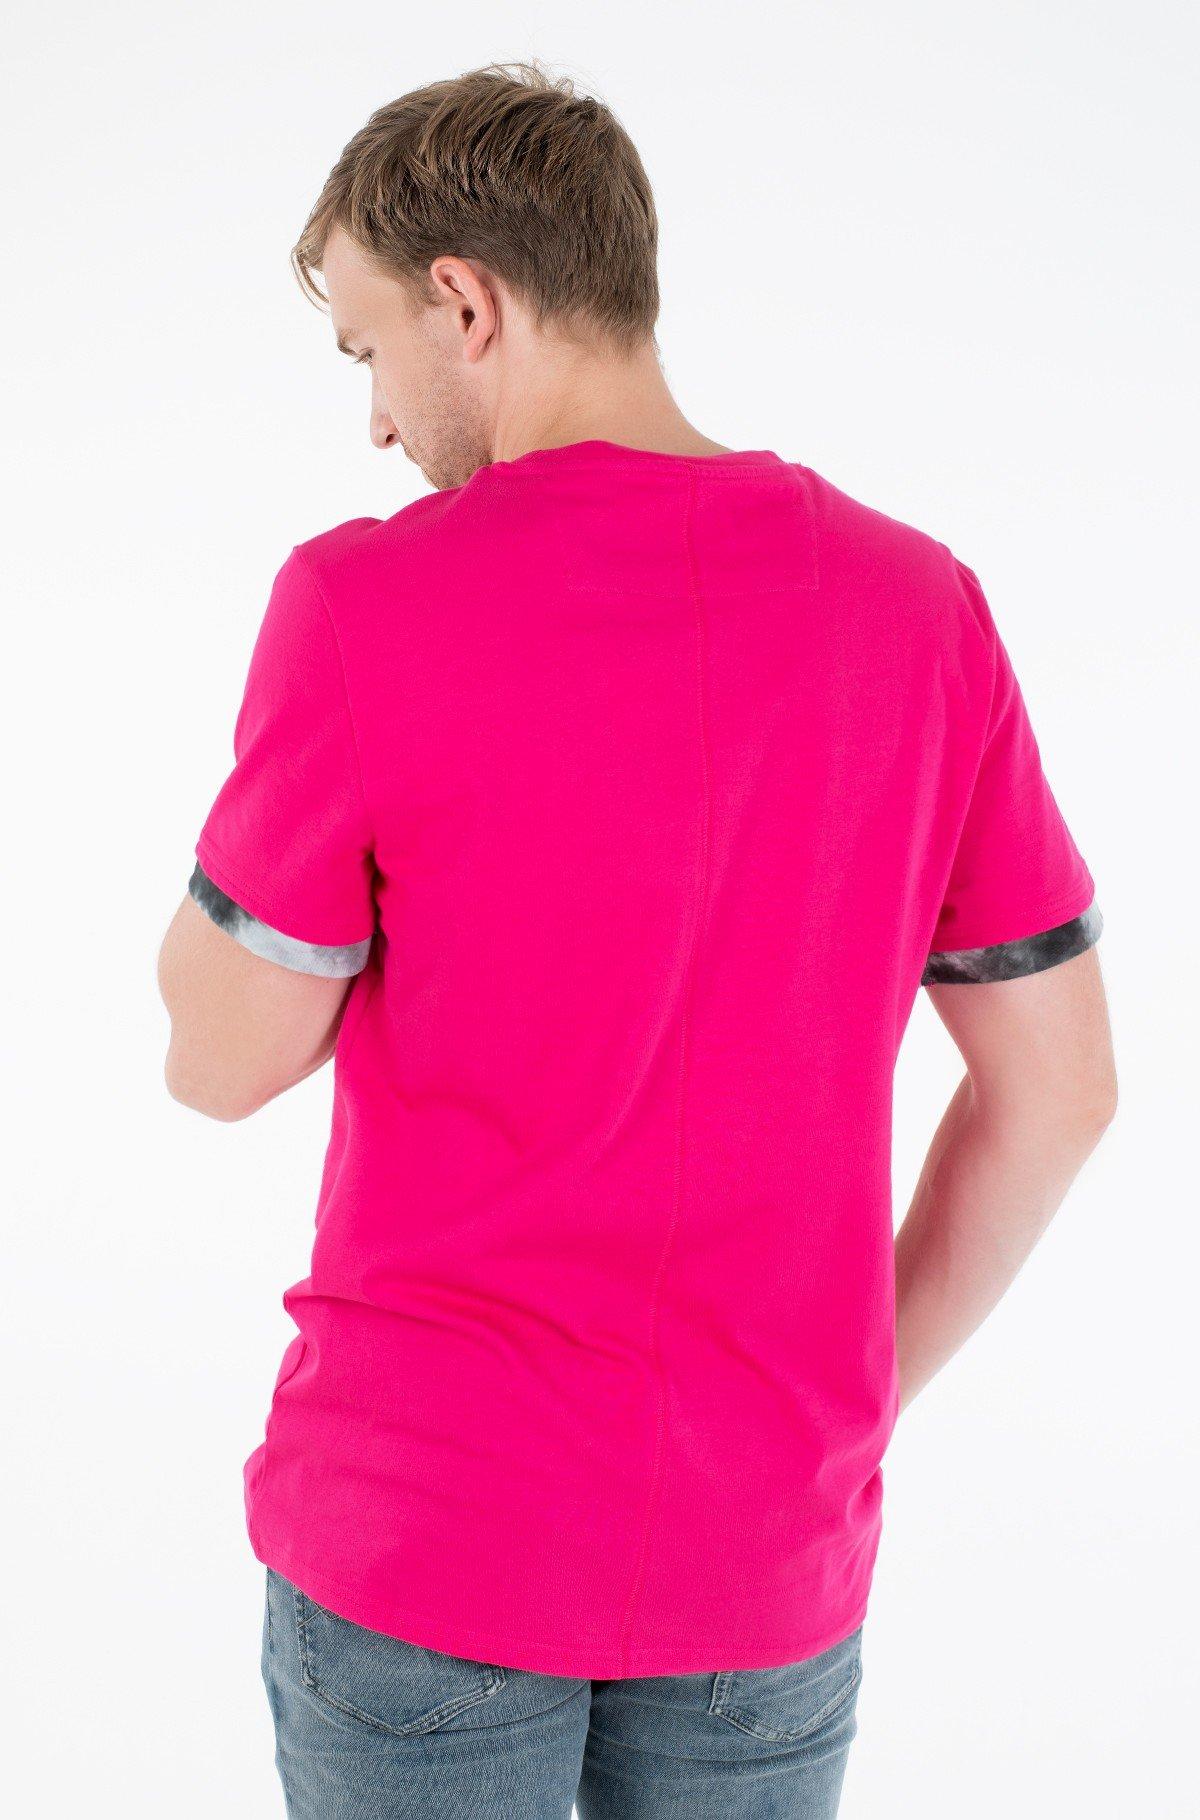 T-shirt M0YI69 K8FQ0-full-2